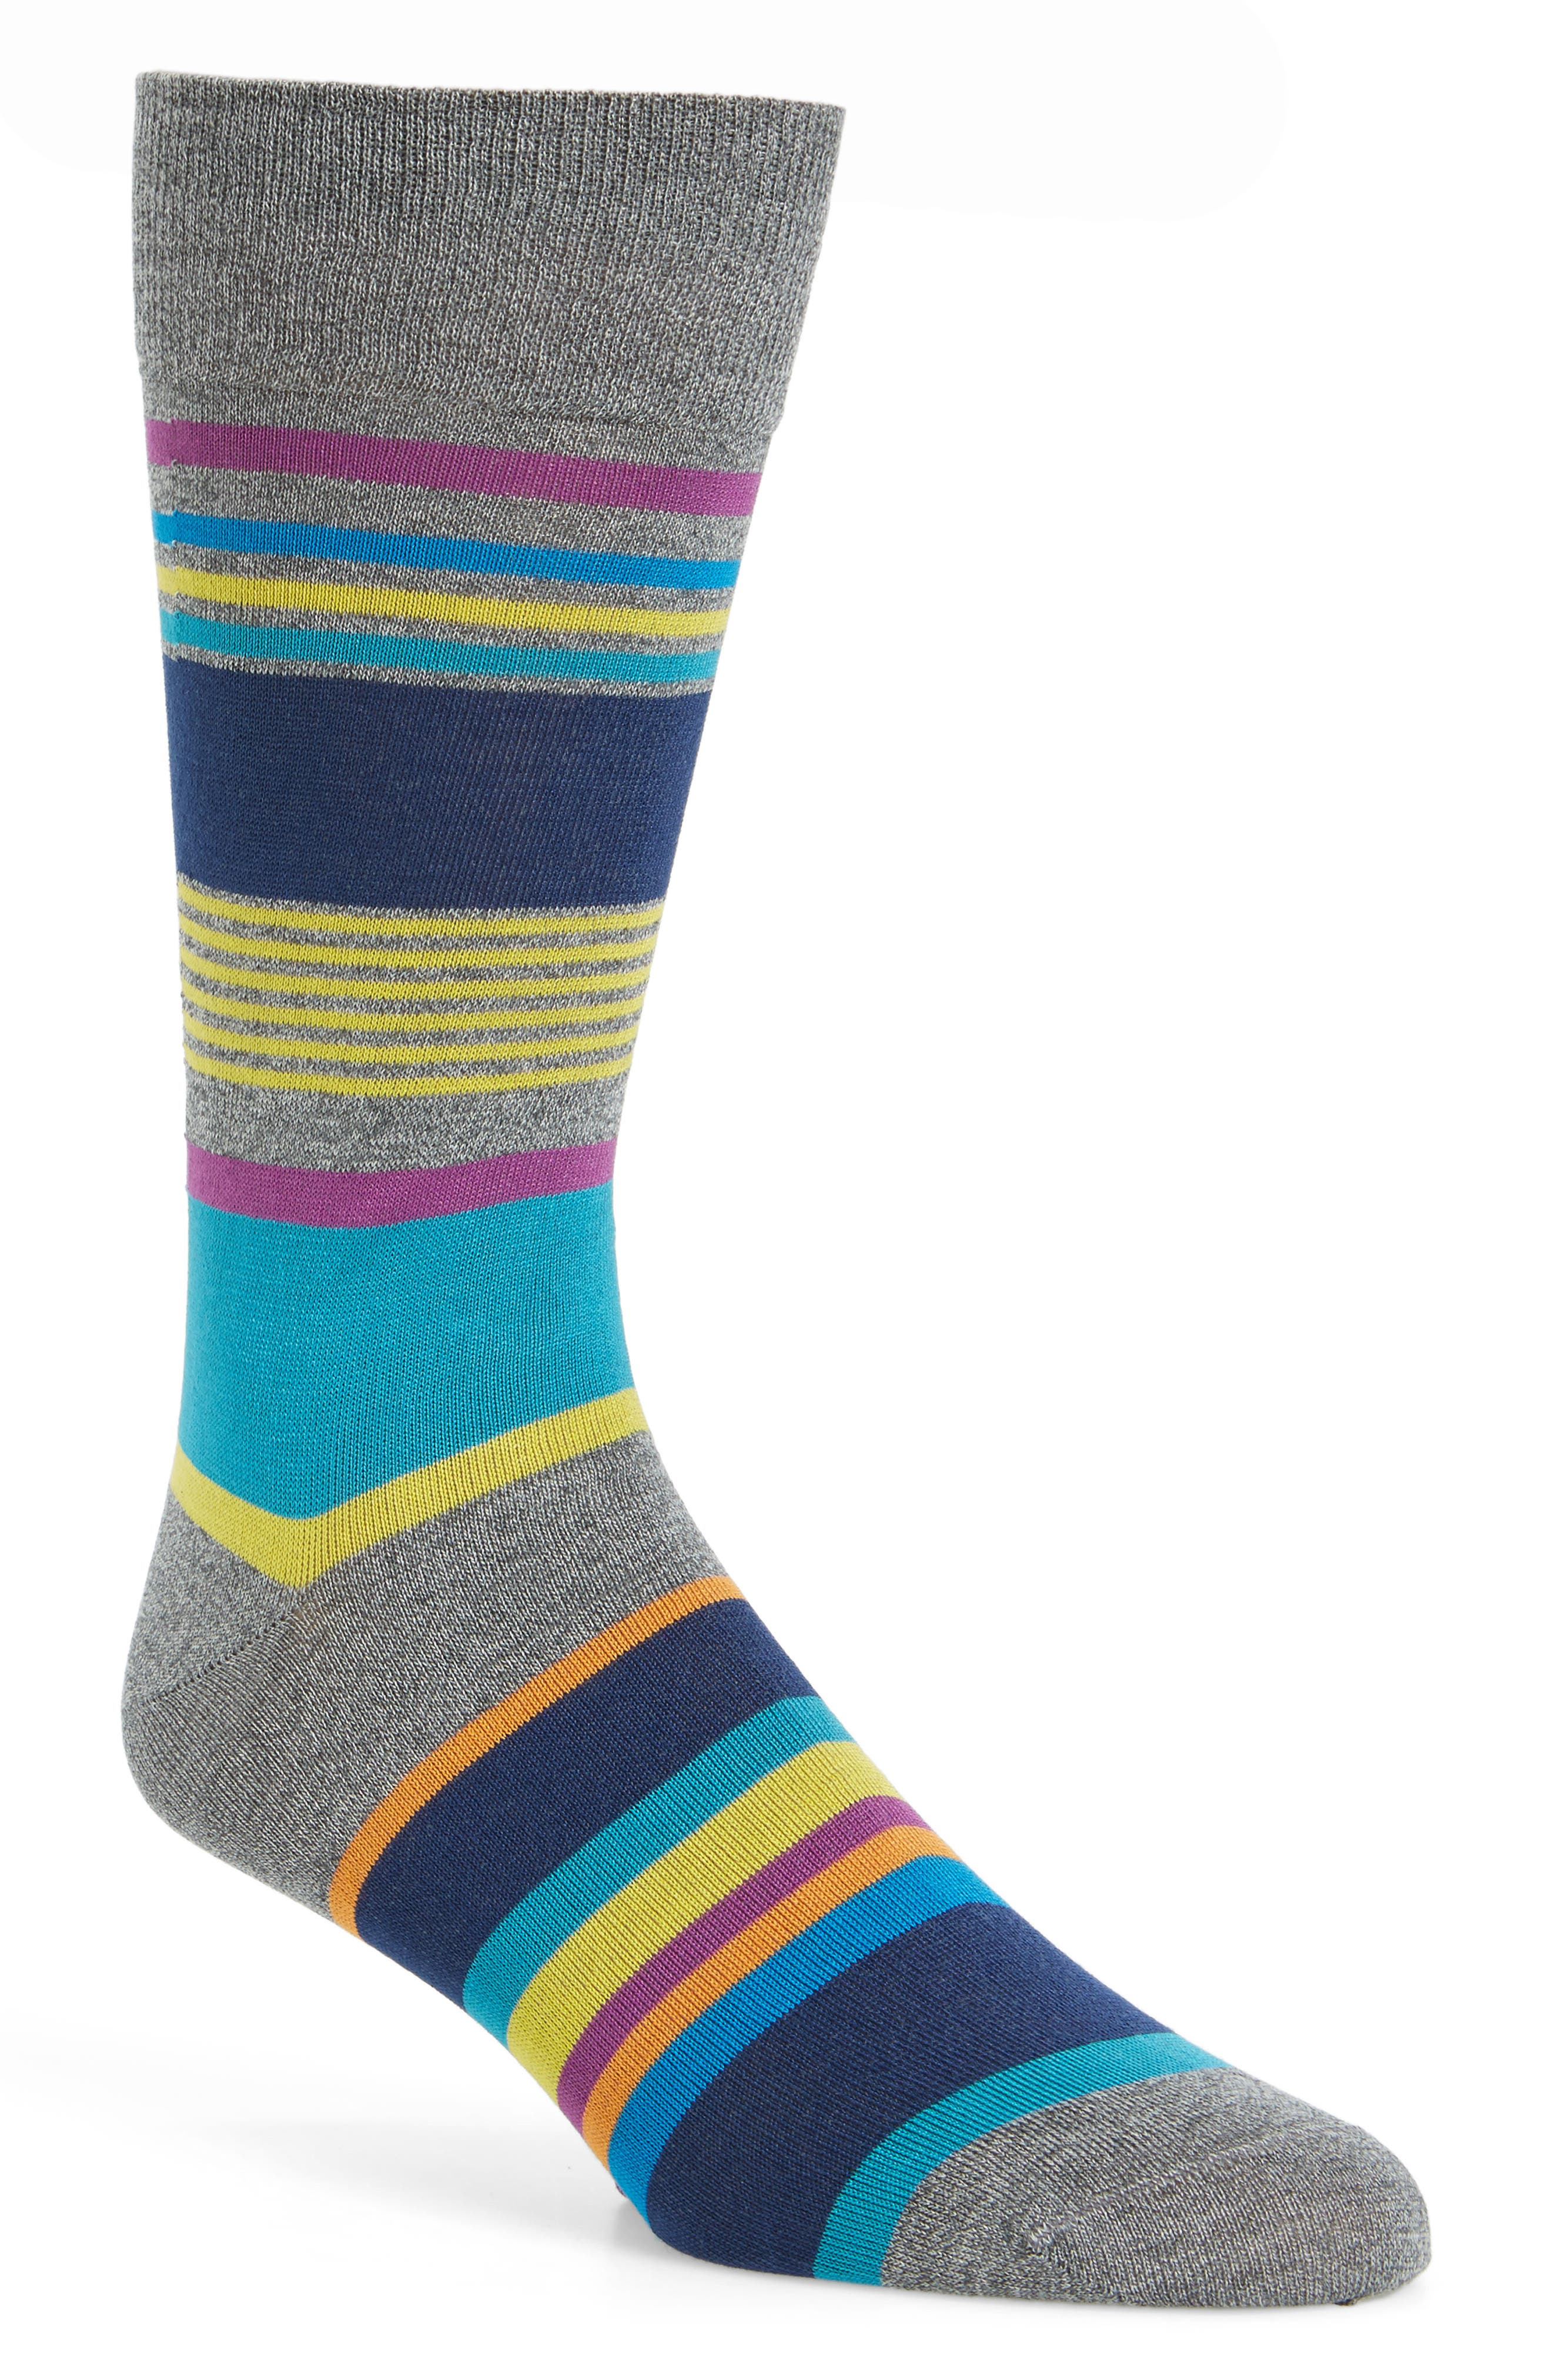 Stripe Socks,                         Main,                         color, Platinum/ Blue